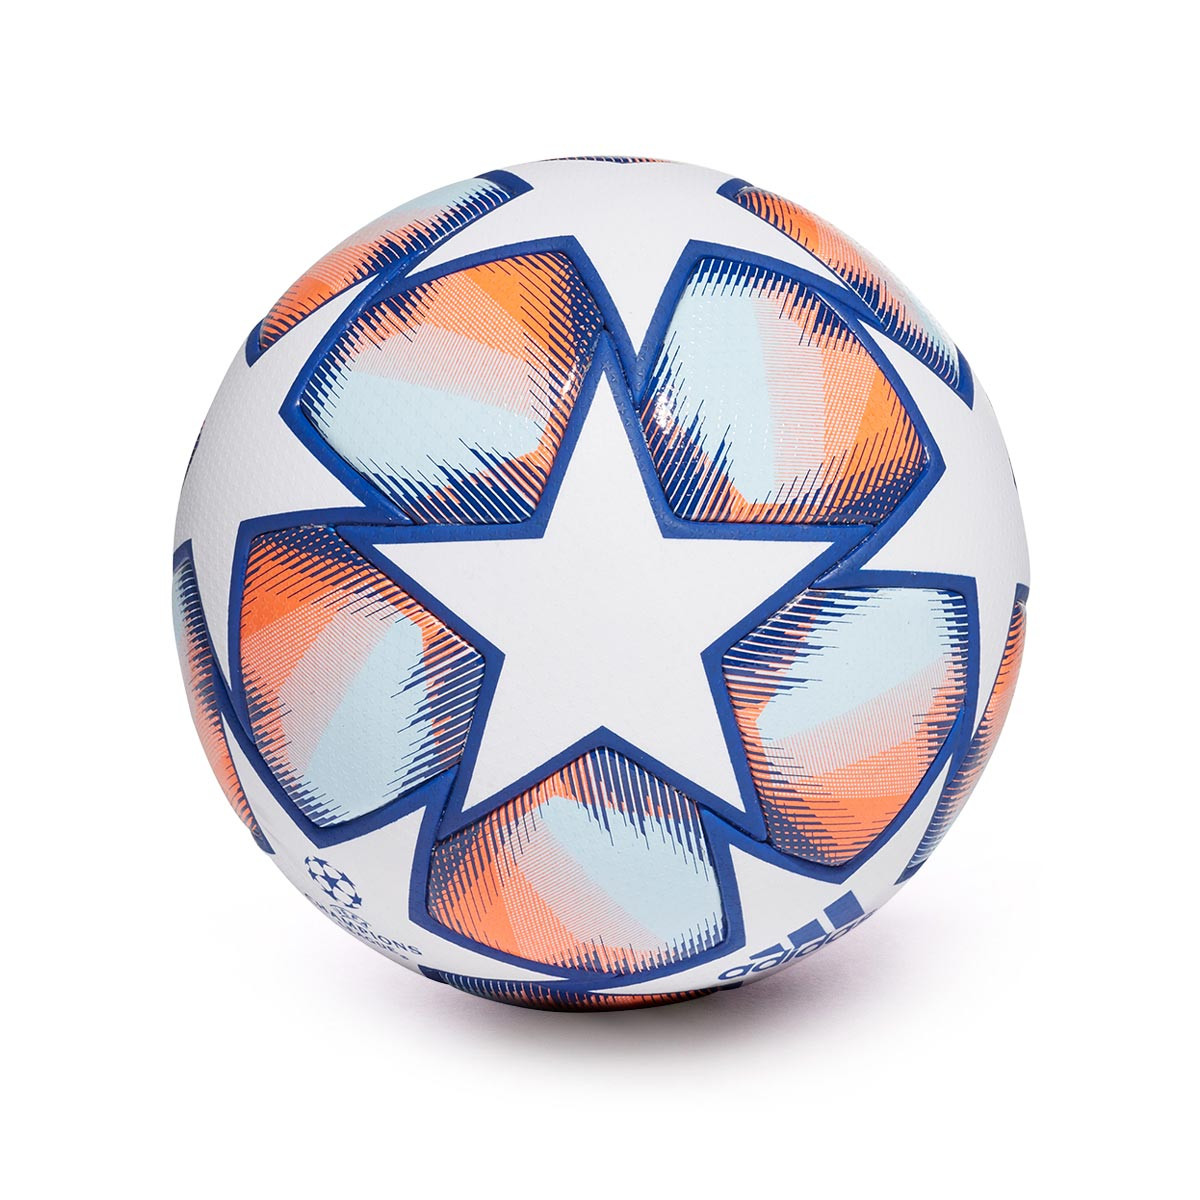 Ahora microondas Acompañar  Balón adidas Finale 20 Pro Champions League White-Team royal blue-Signal  coral-Sky tint - Tienda de fútbol Fútbol Emotion